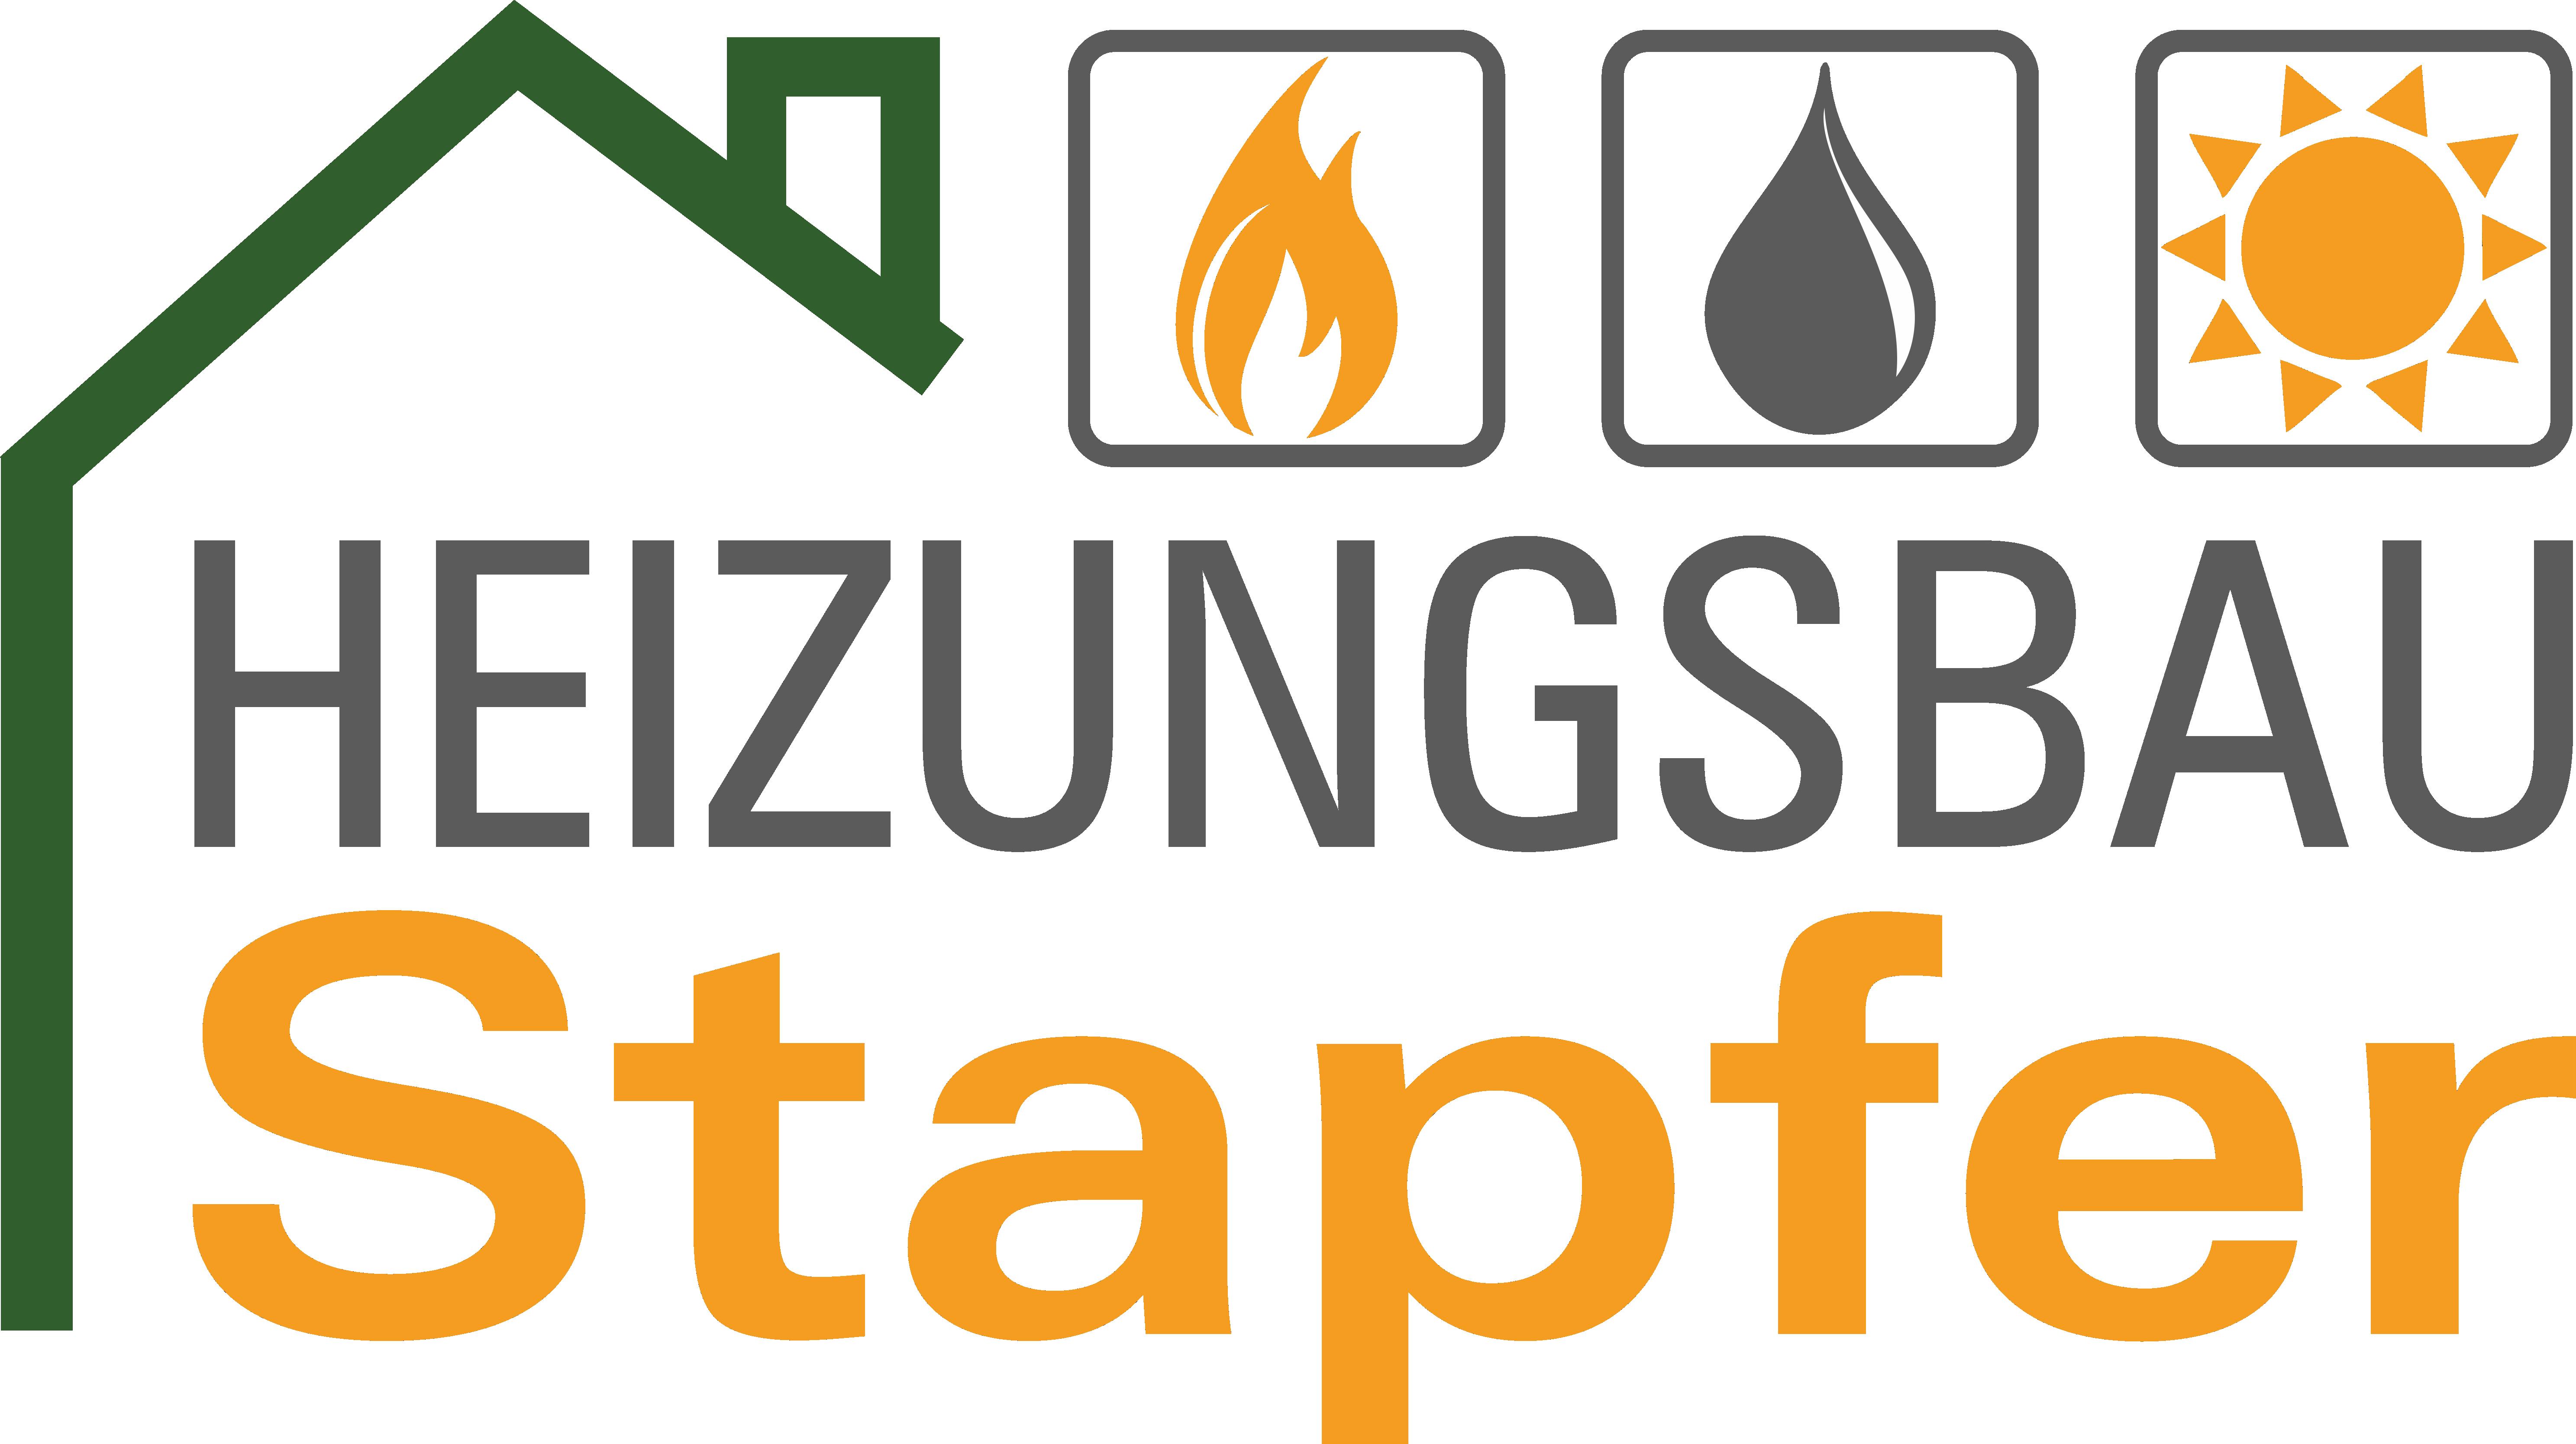 Heizungsbau Stapfer GmbH